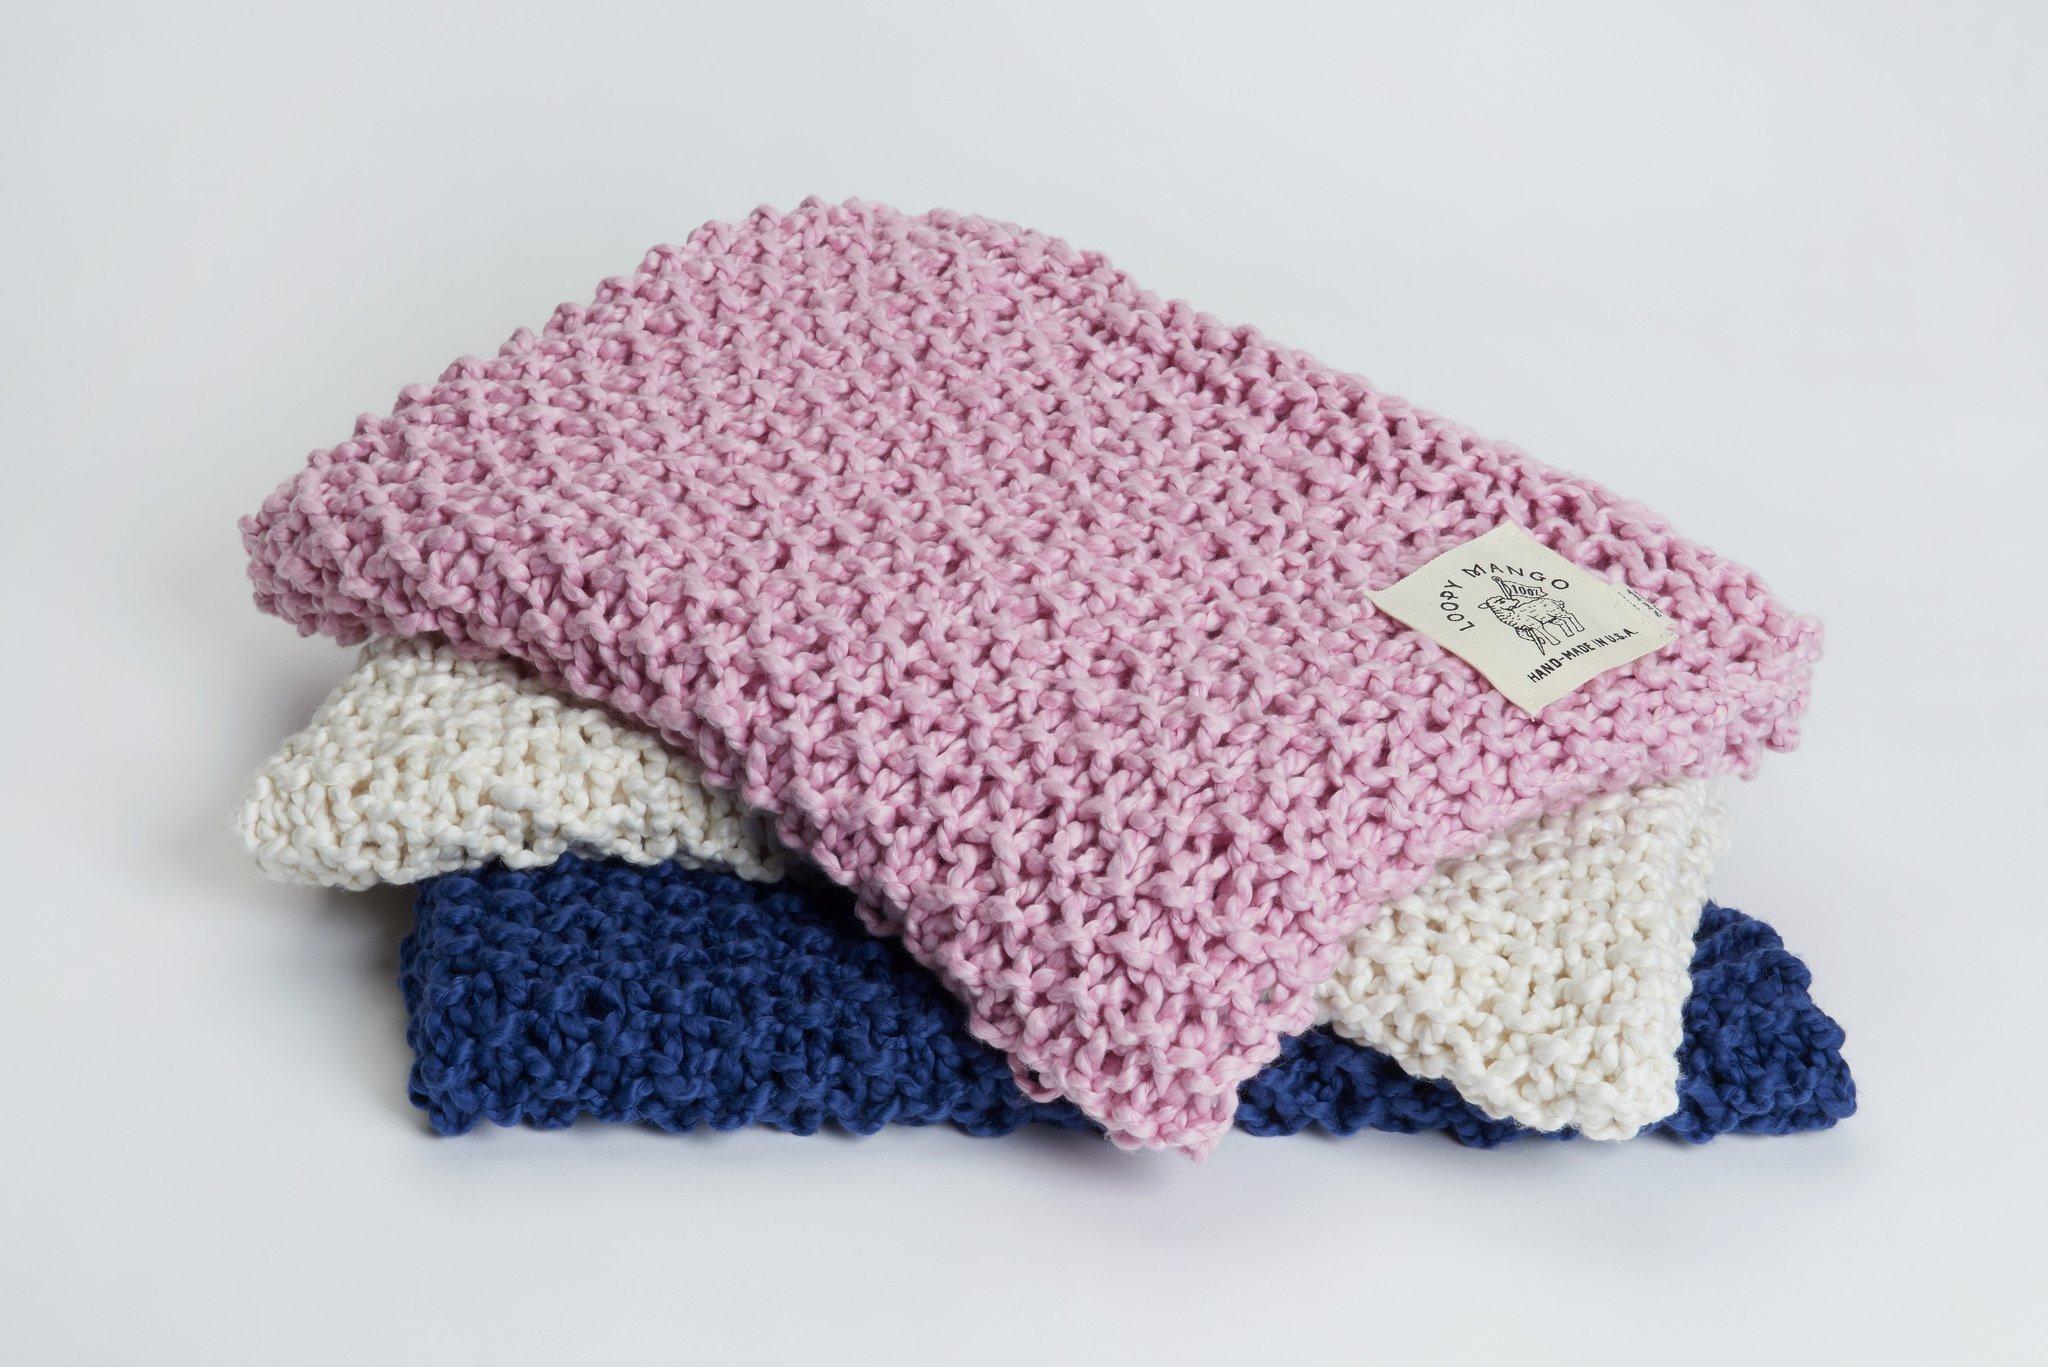 Loopy Mango DIY Kit - Cotton Baby Blanket-Tahitian Pearl by Loopy Mango (Image #4)